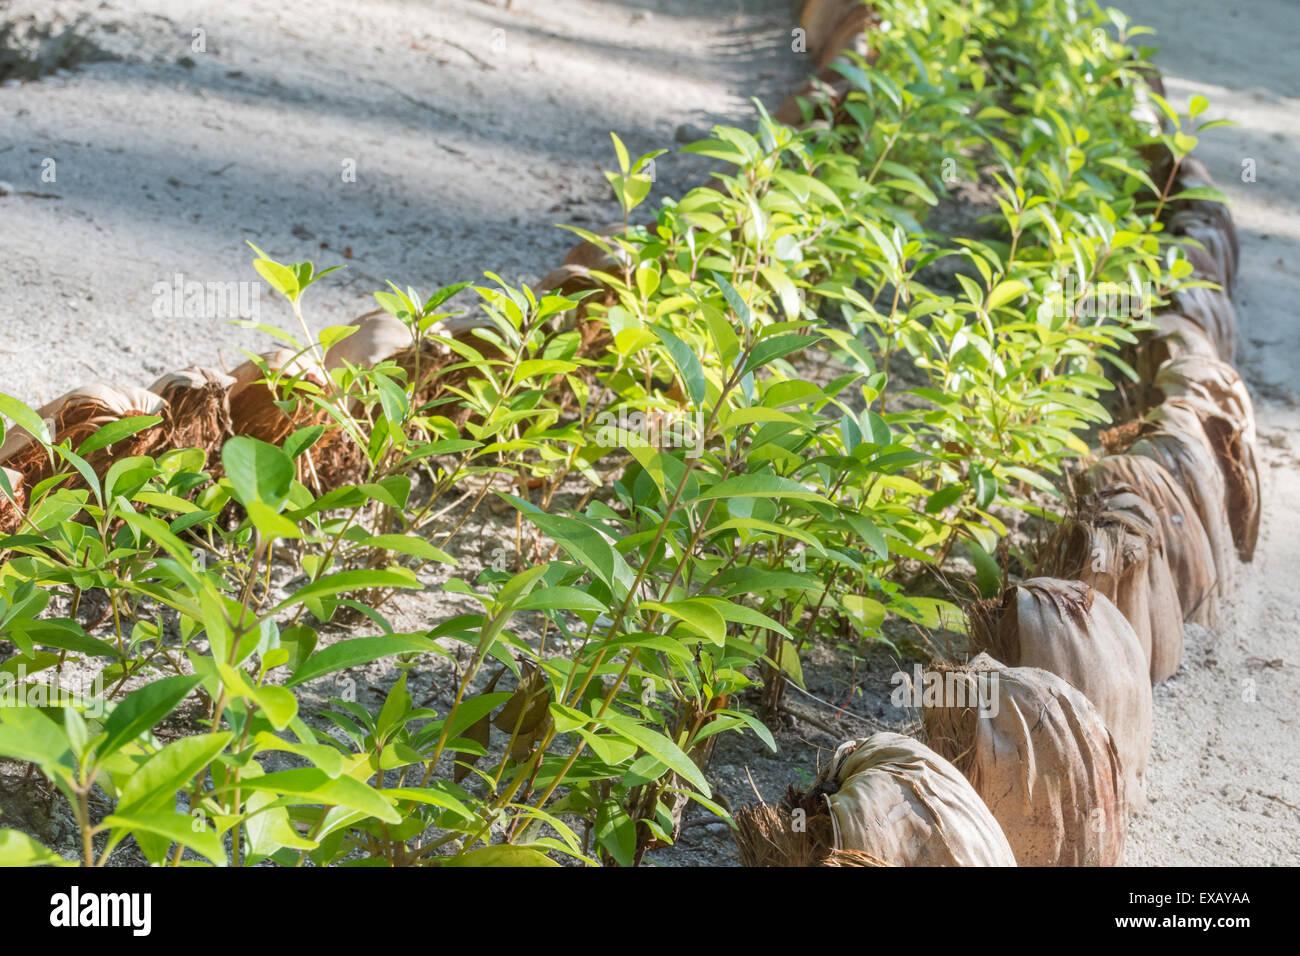 Covers Green Stockfotos & Covers Green Bilder - Seite 33 - Alamy